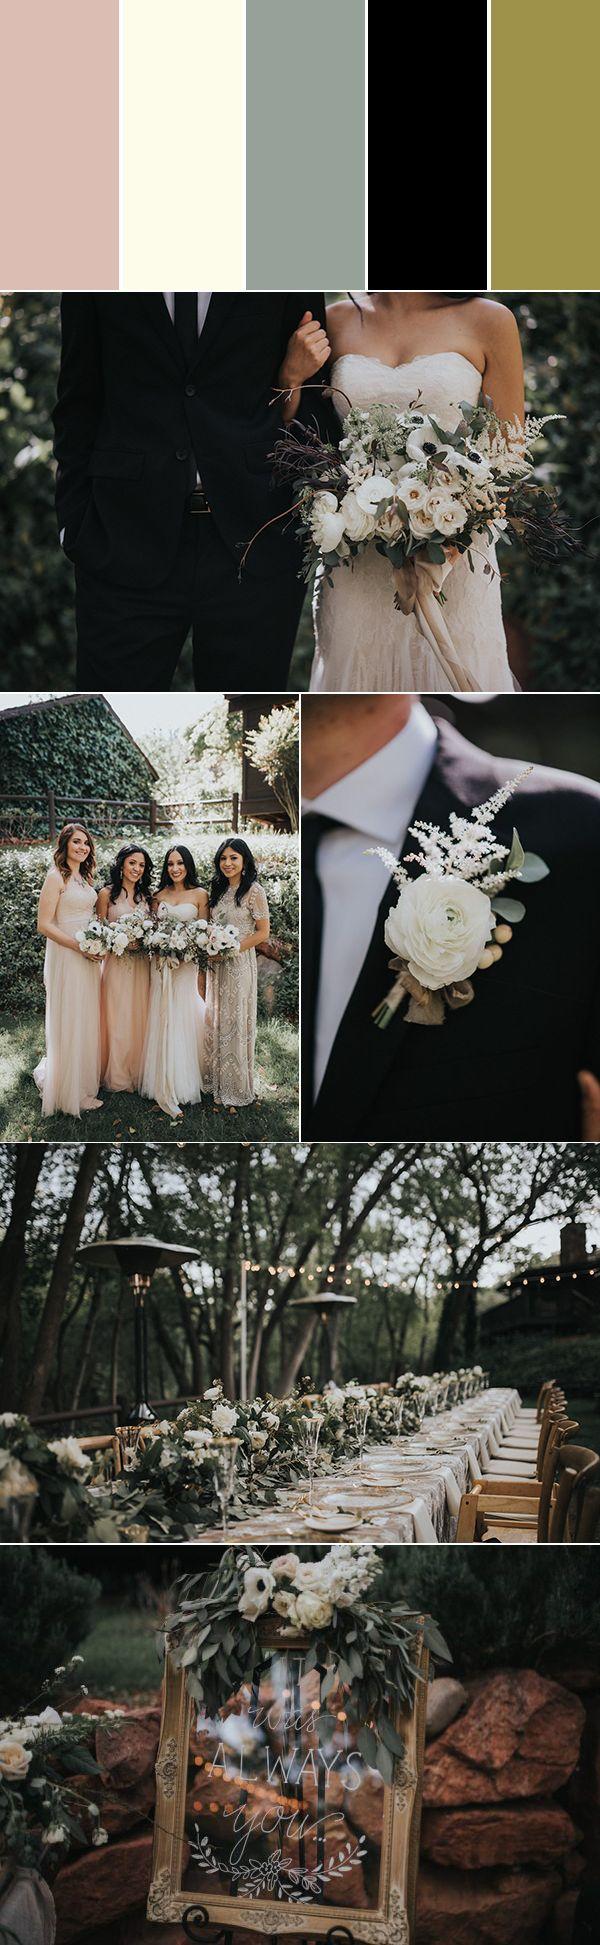 Modern romantic neutral palette | photos by Jonnie & Garrett